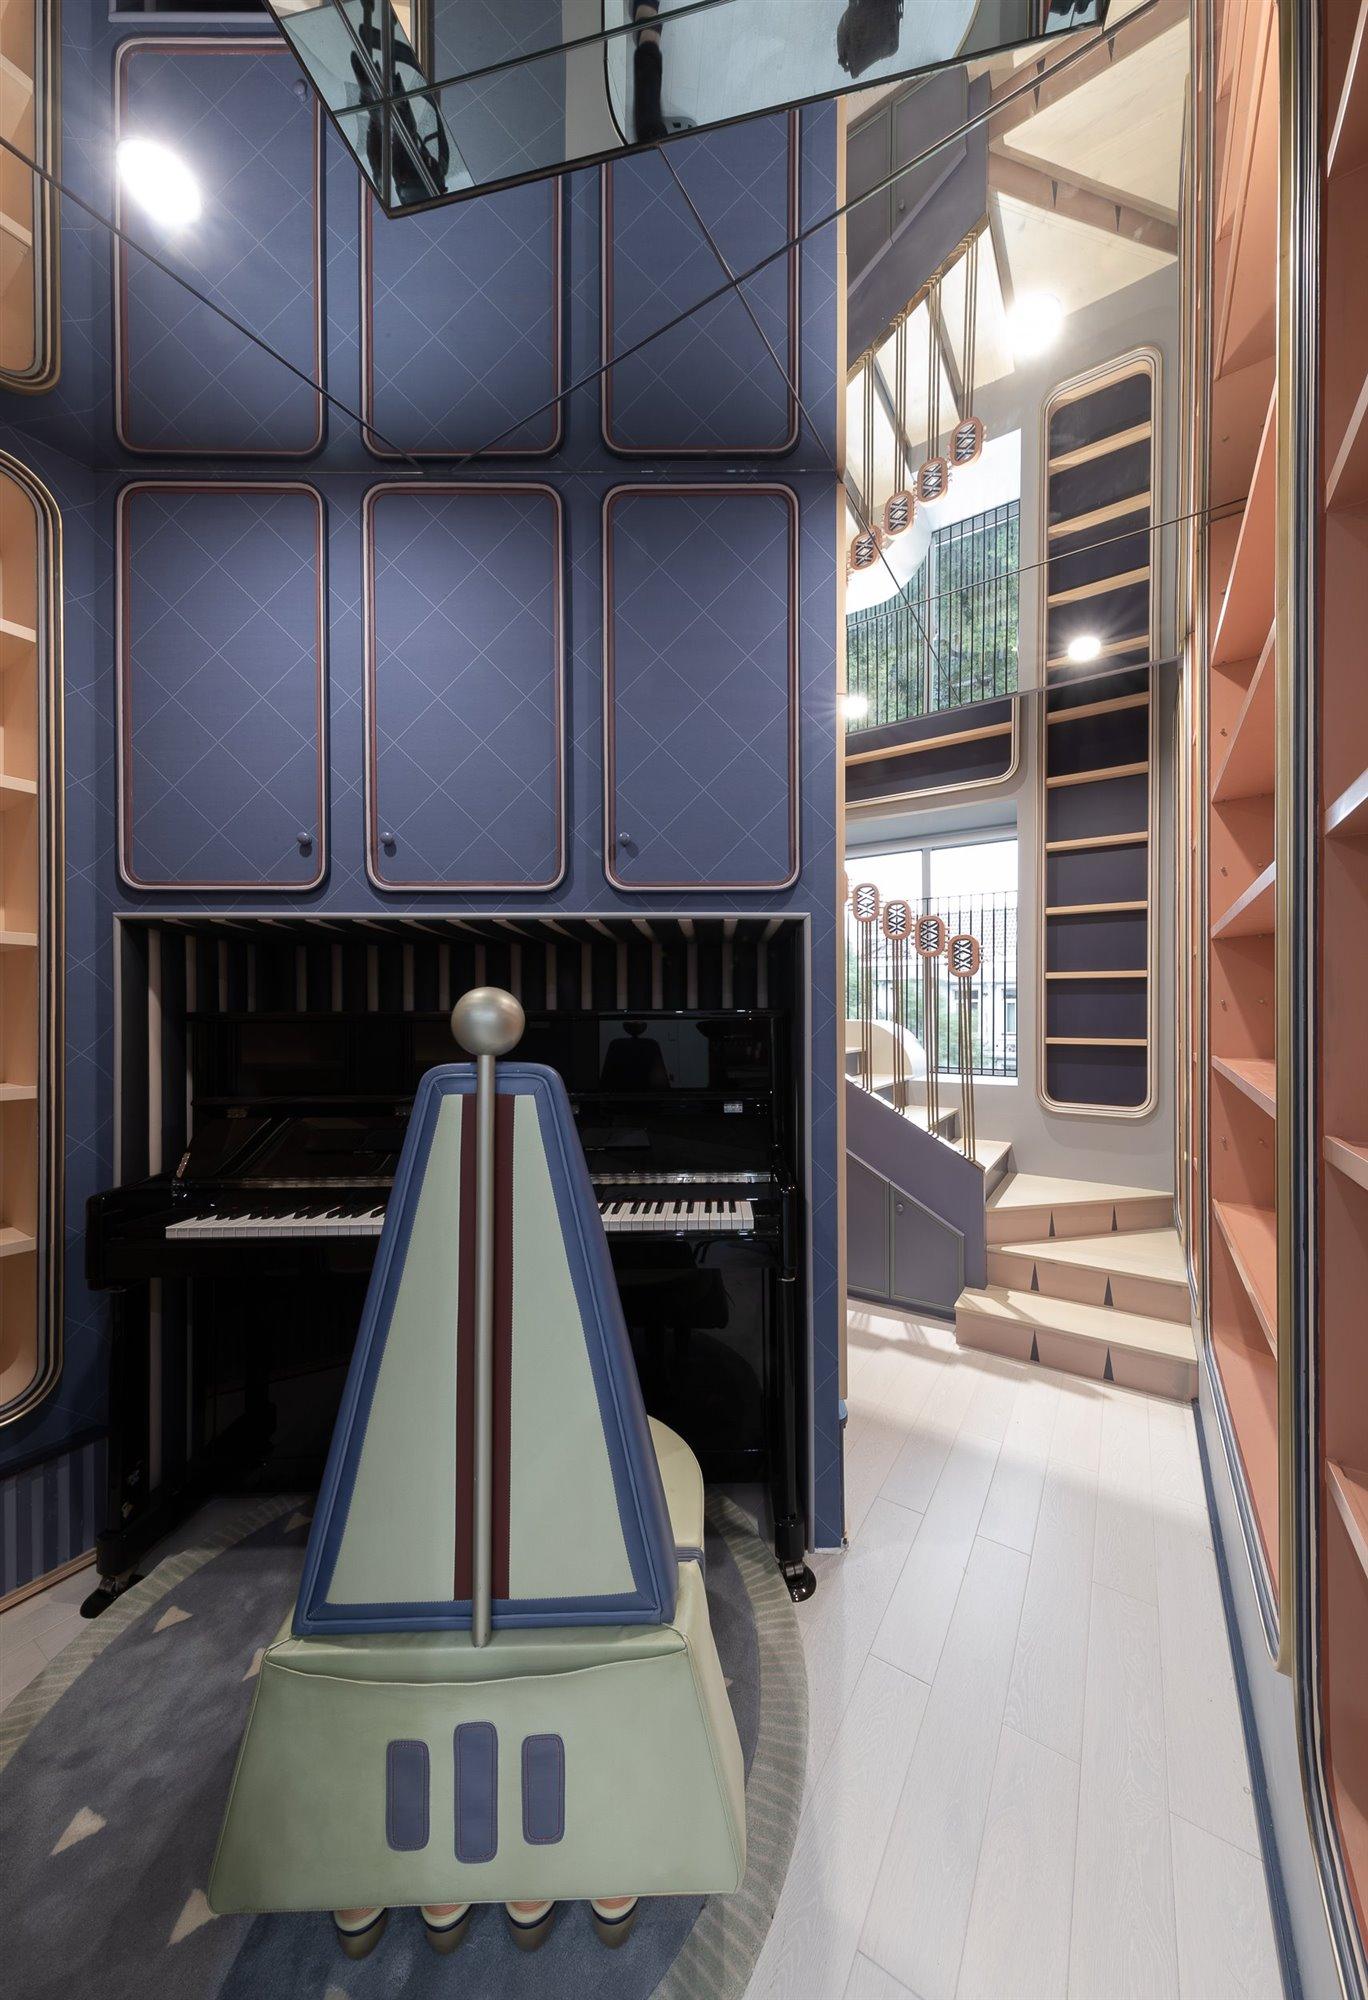 Small 10x10 Study Room Layout: Un Apartamento Rehabilitado Por El Reality 'Dream Home